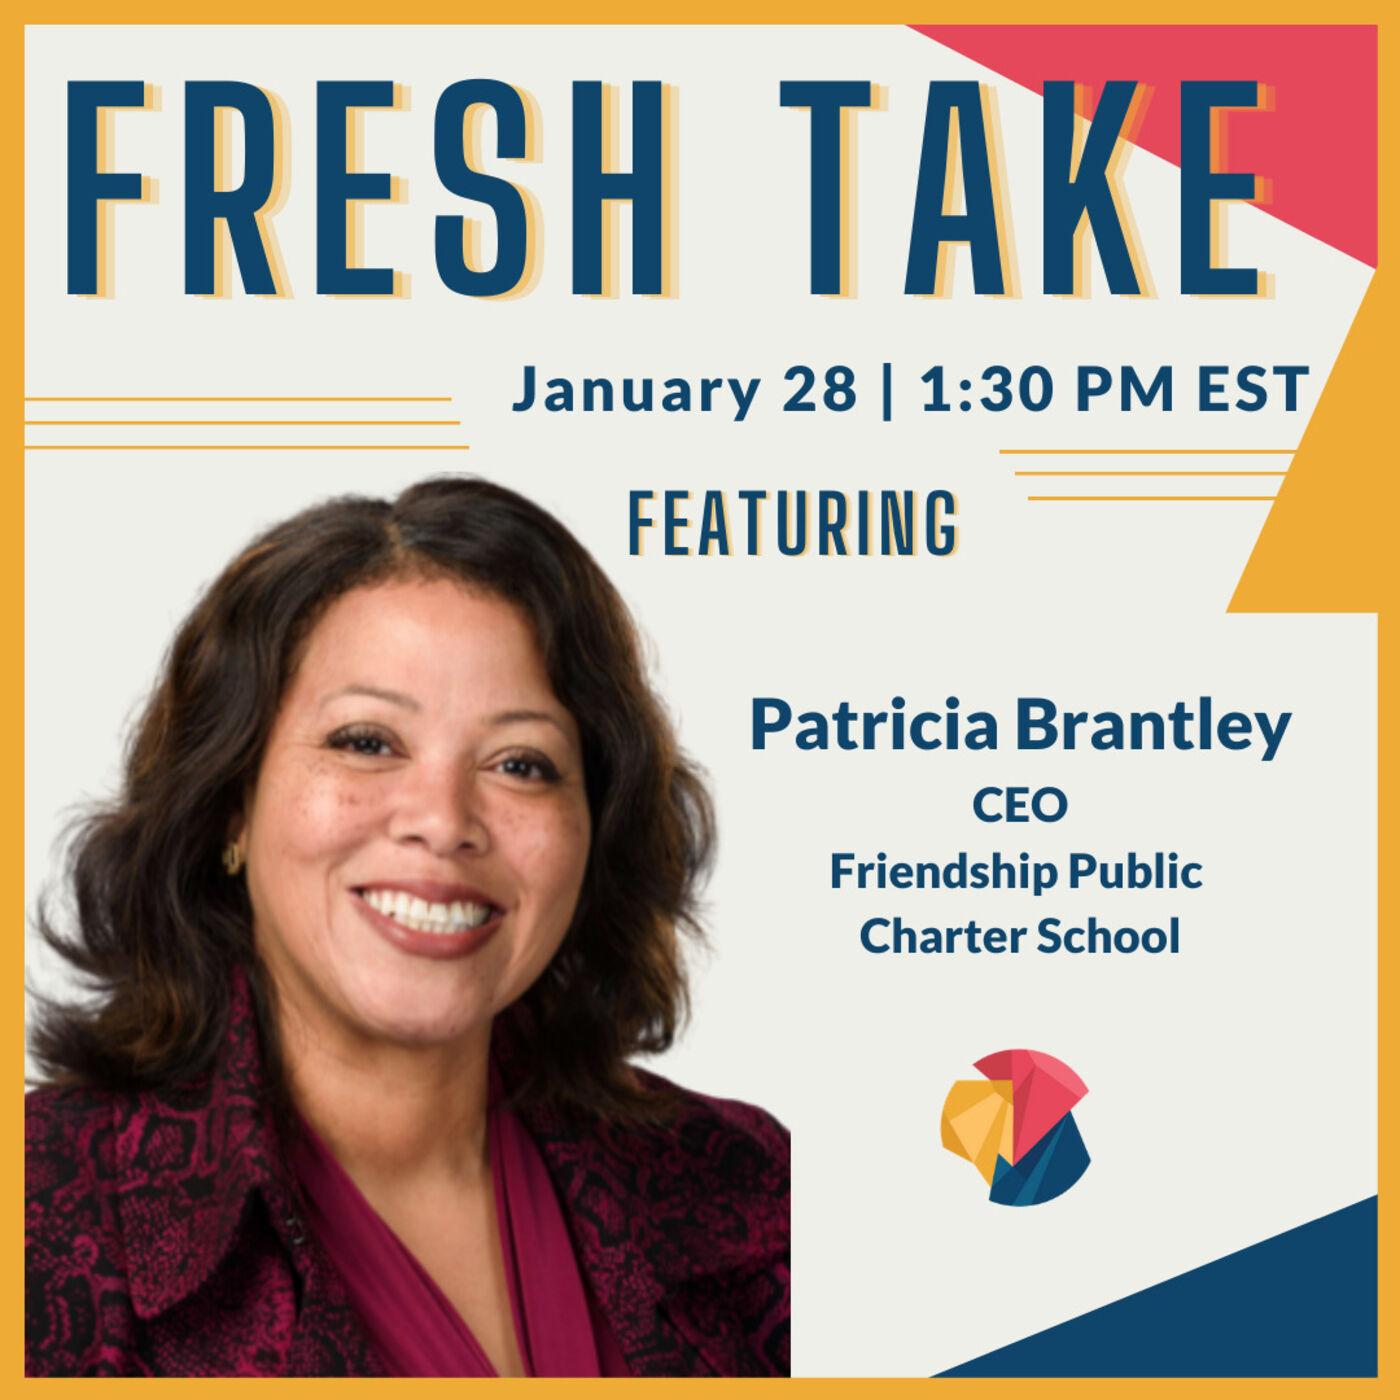 Fresh Take ft. Patricia Brantley